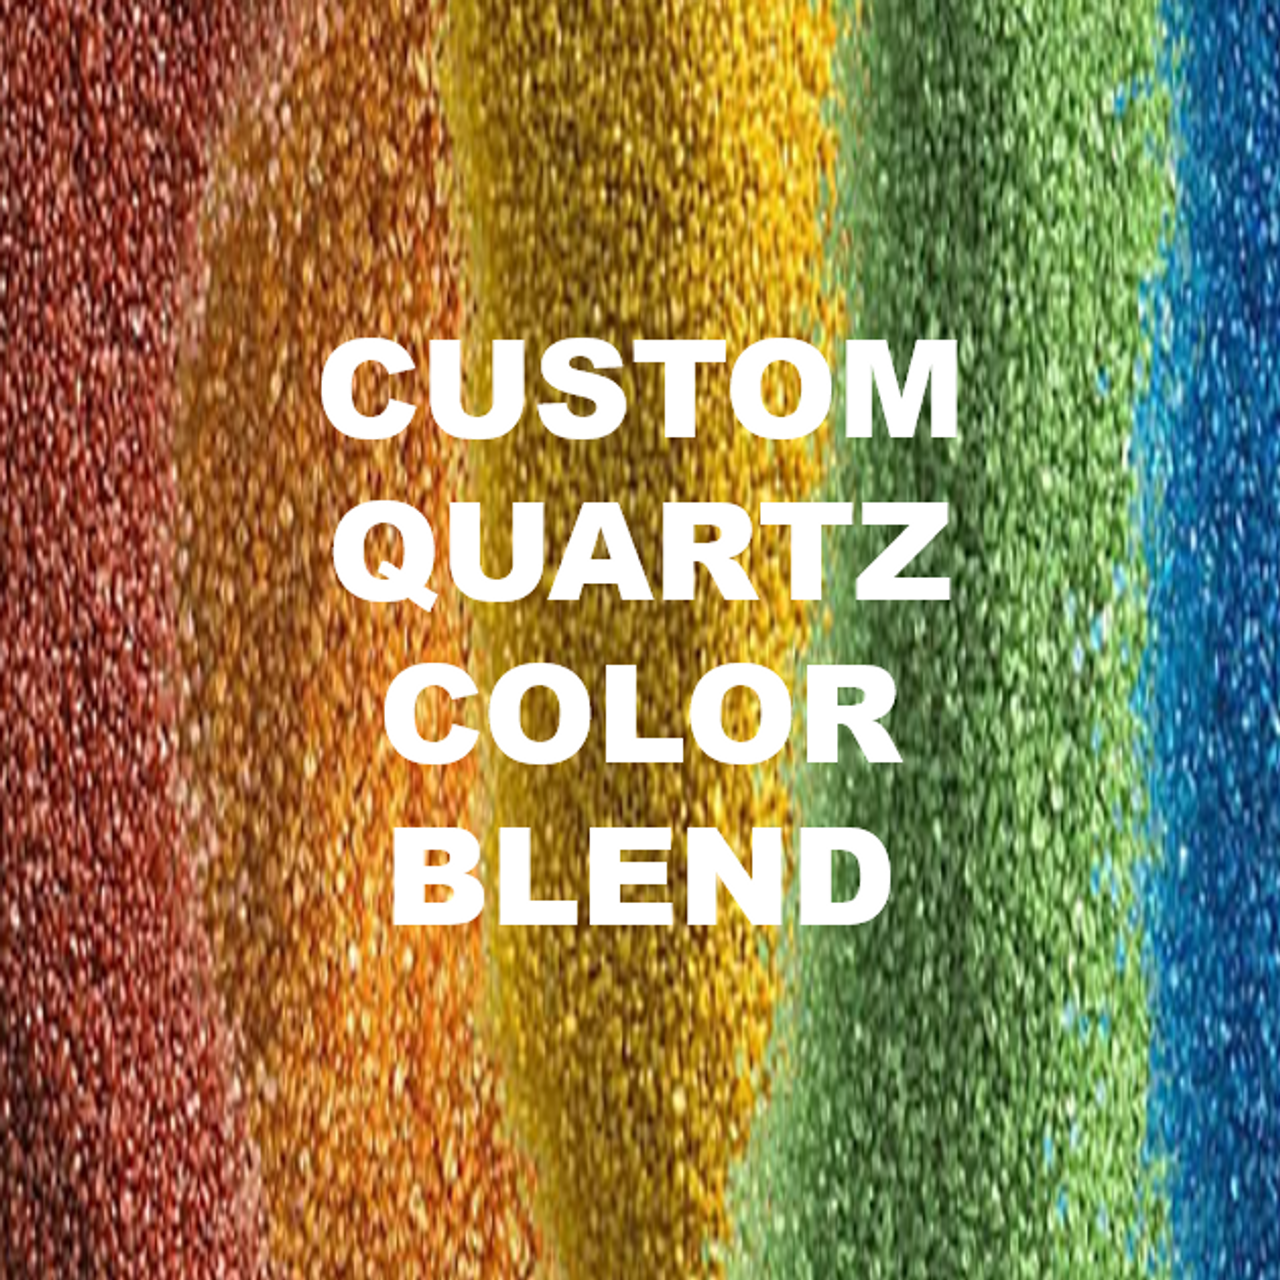 Custom Blended Quartz - 50 lb. bag  SHIPS FROM TORGINOL